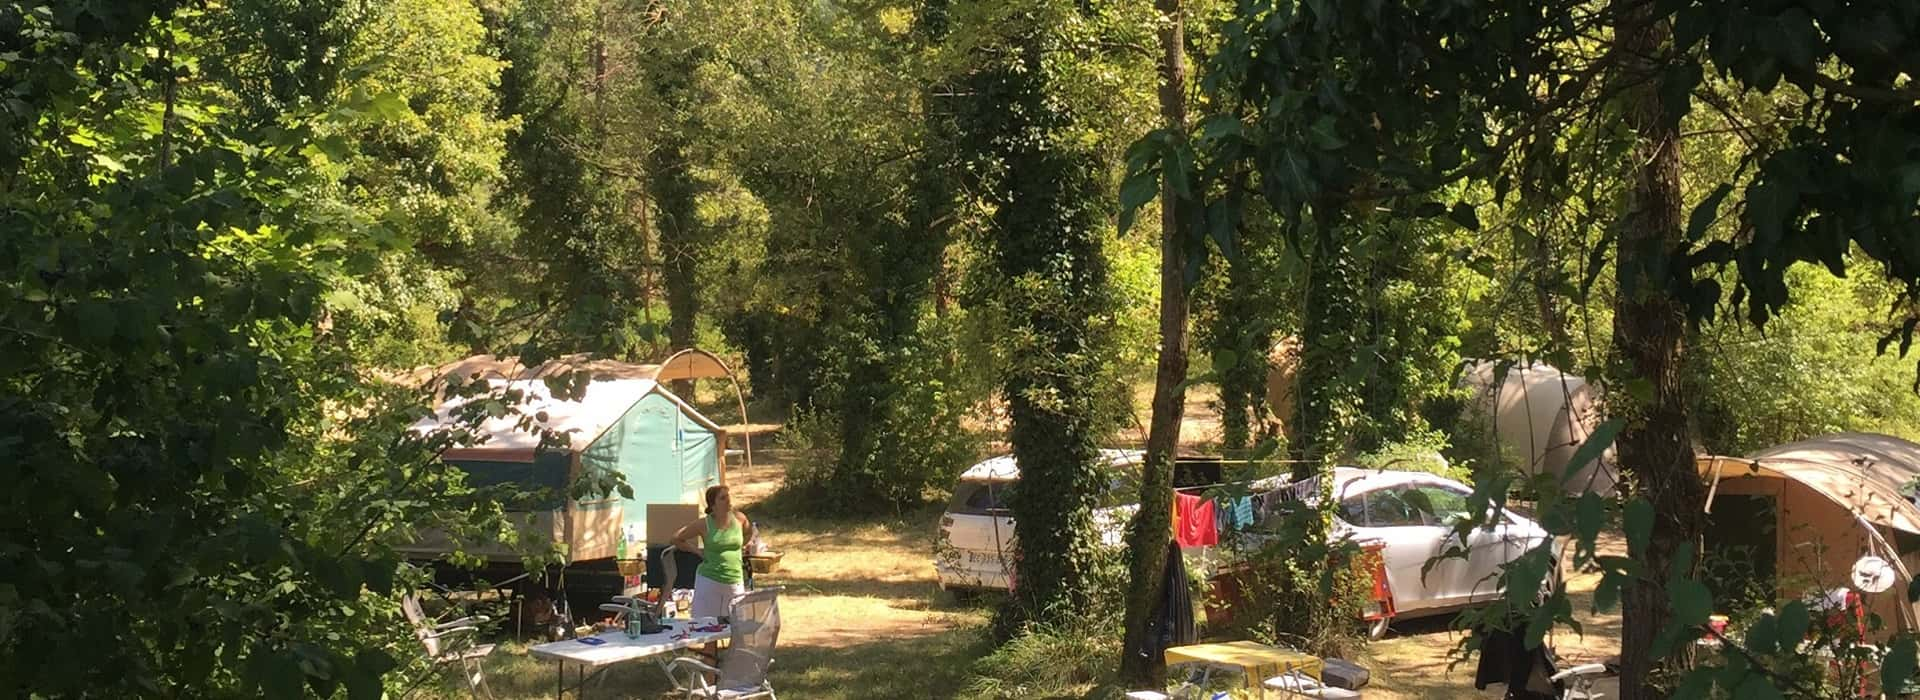 Camping les chapelains dr me slow tourisme nature famille for Camping montelimar piscine